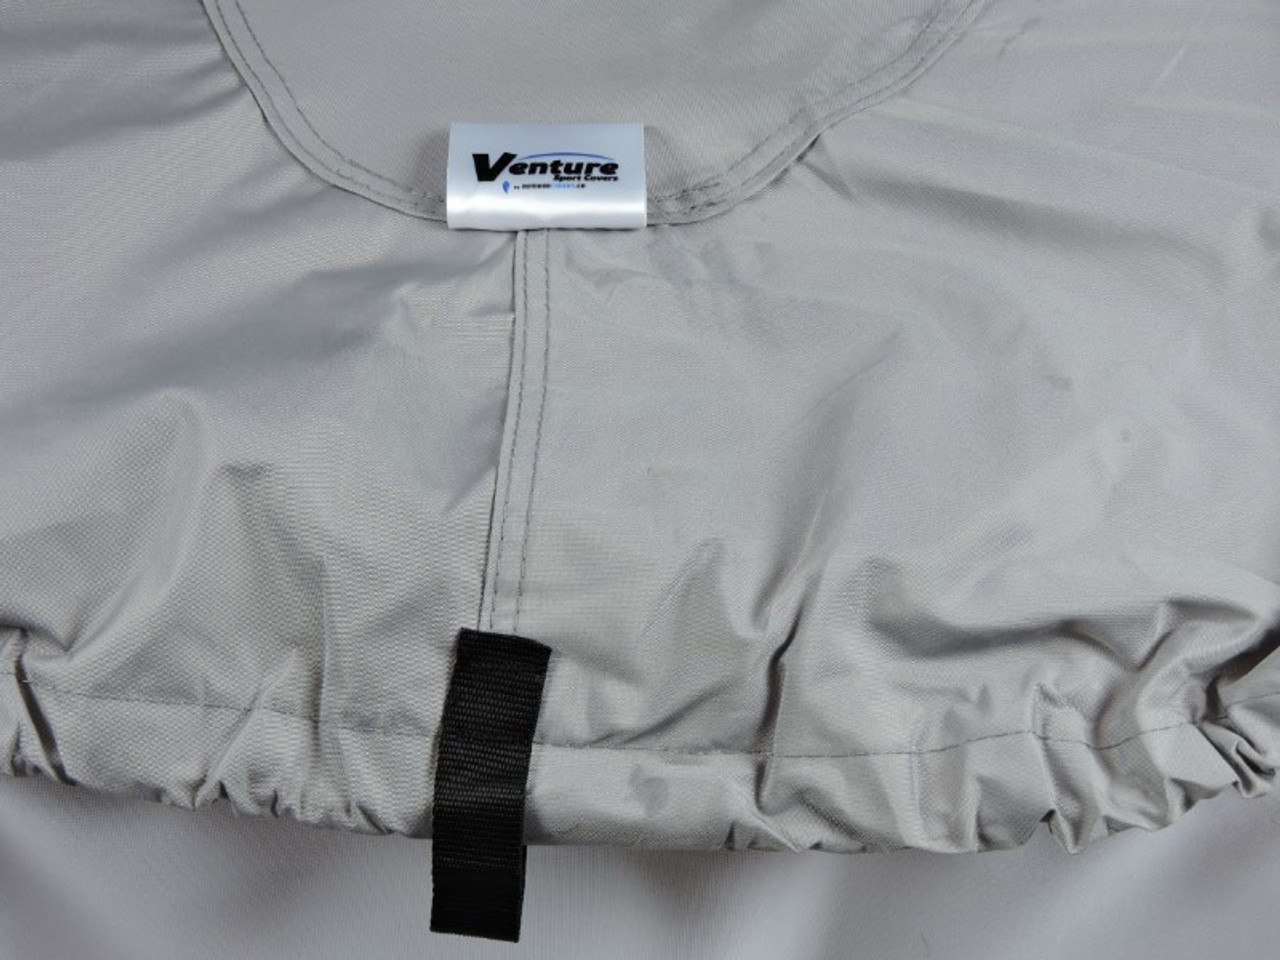 Venture all season storage cover nose strap loop